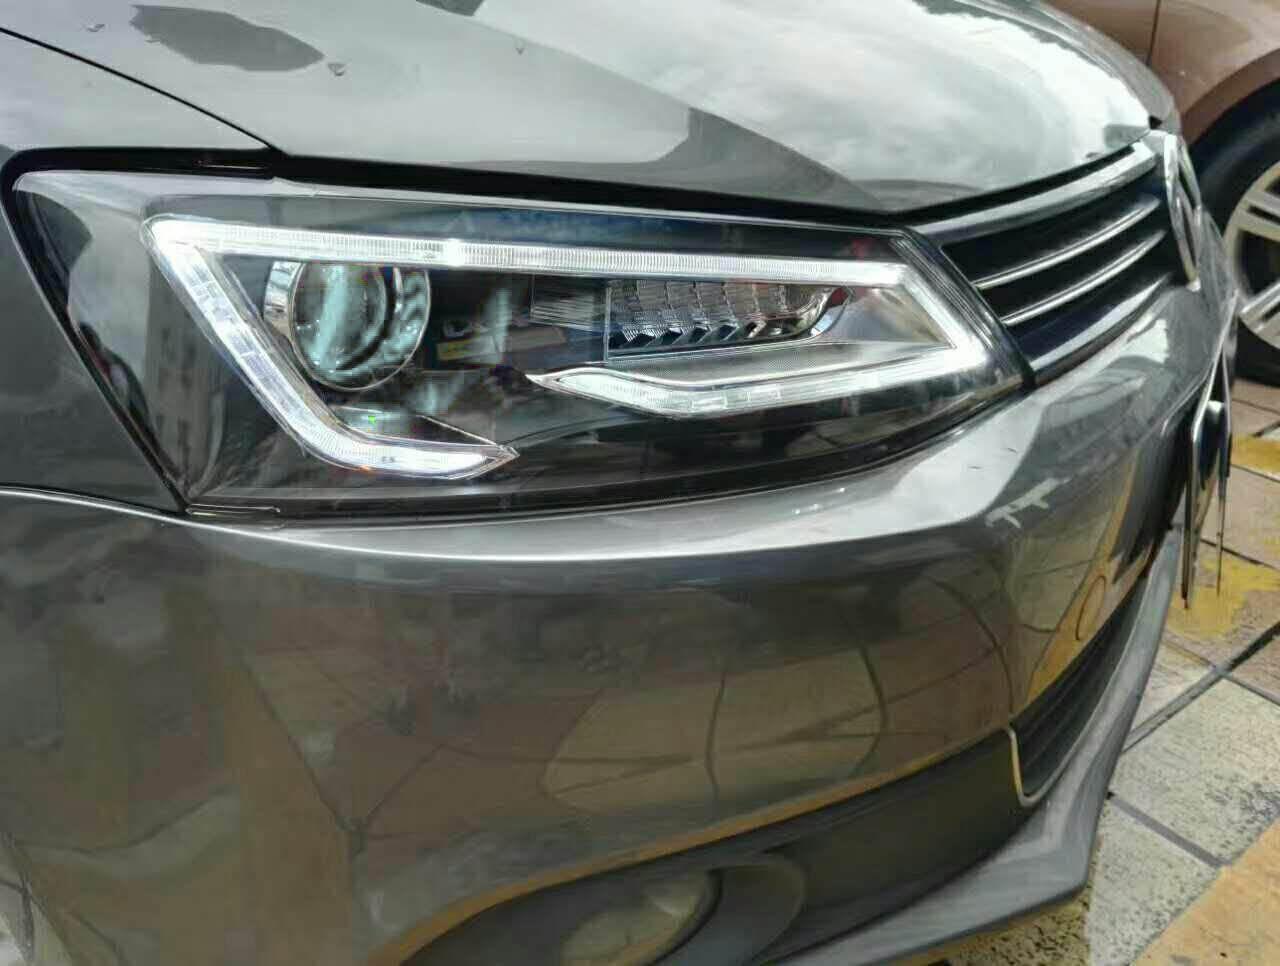 E Mark Ccc Ccertification Vland Car Lamps For Volkswagen Jetta